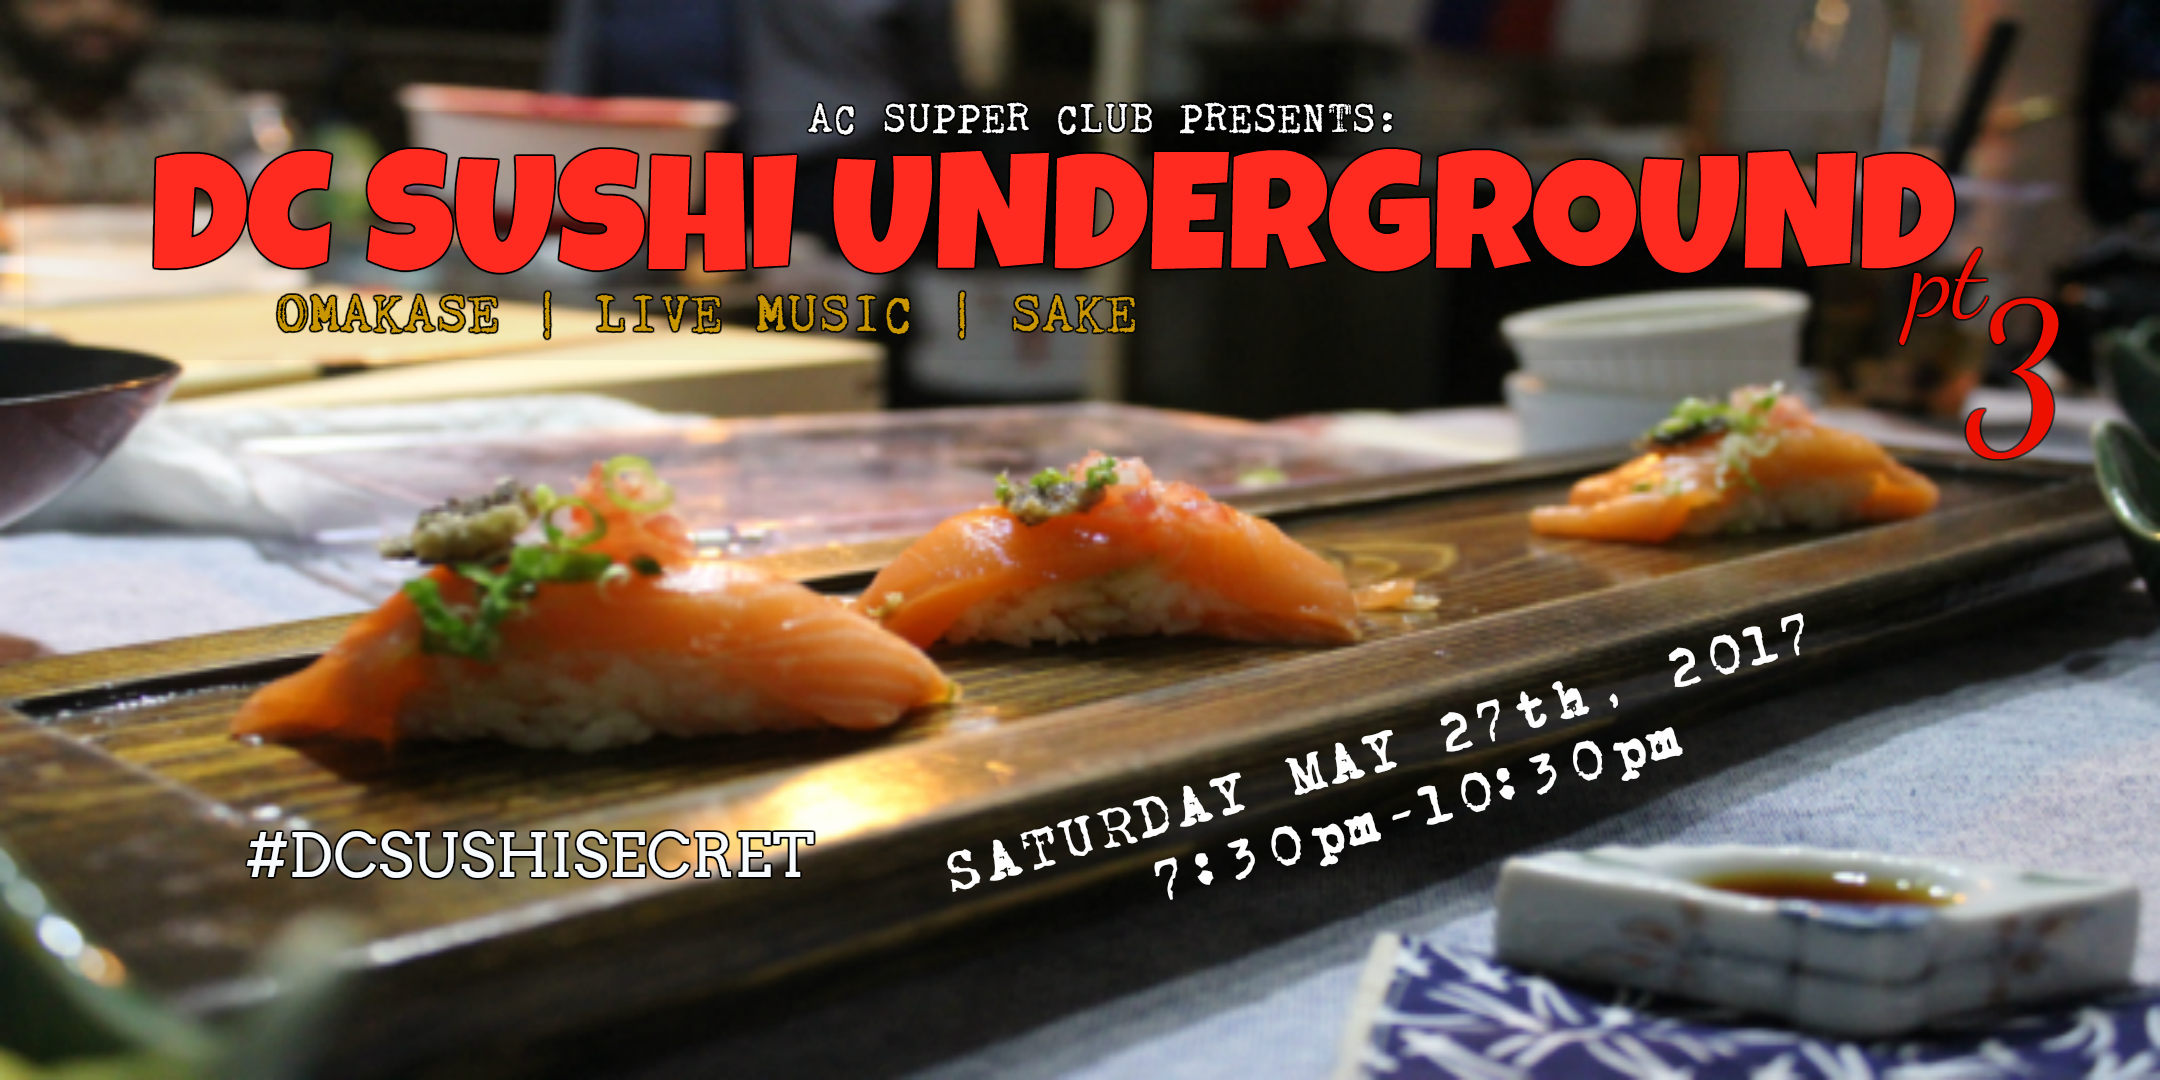 DC Sushi Underground 3 by AC Supper Club